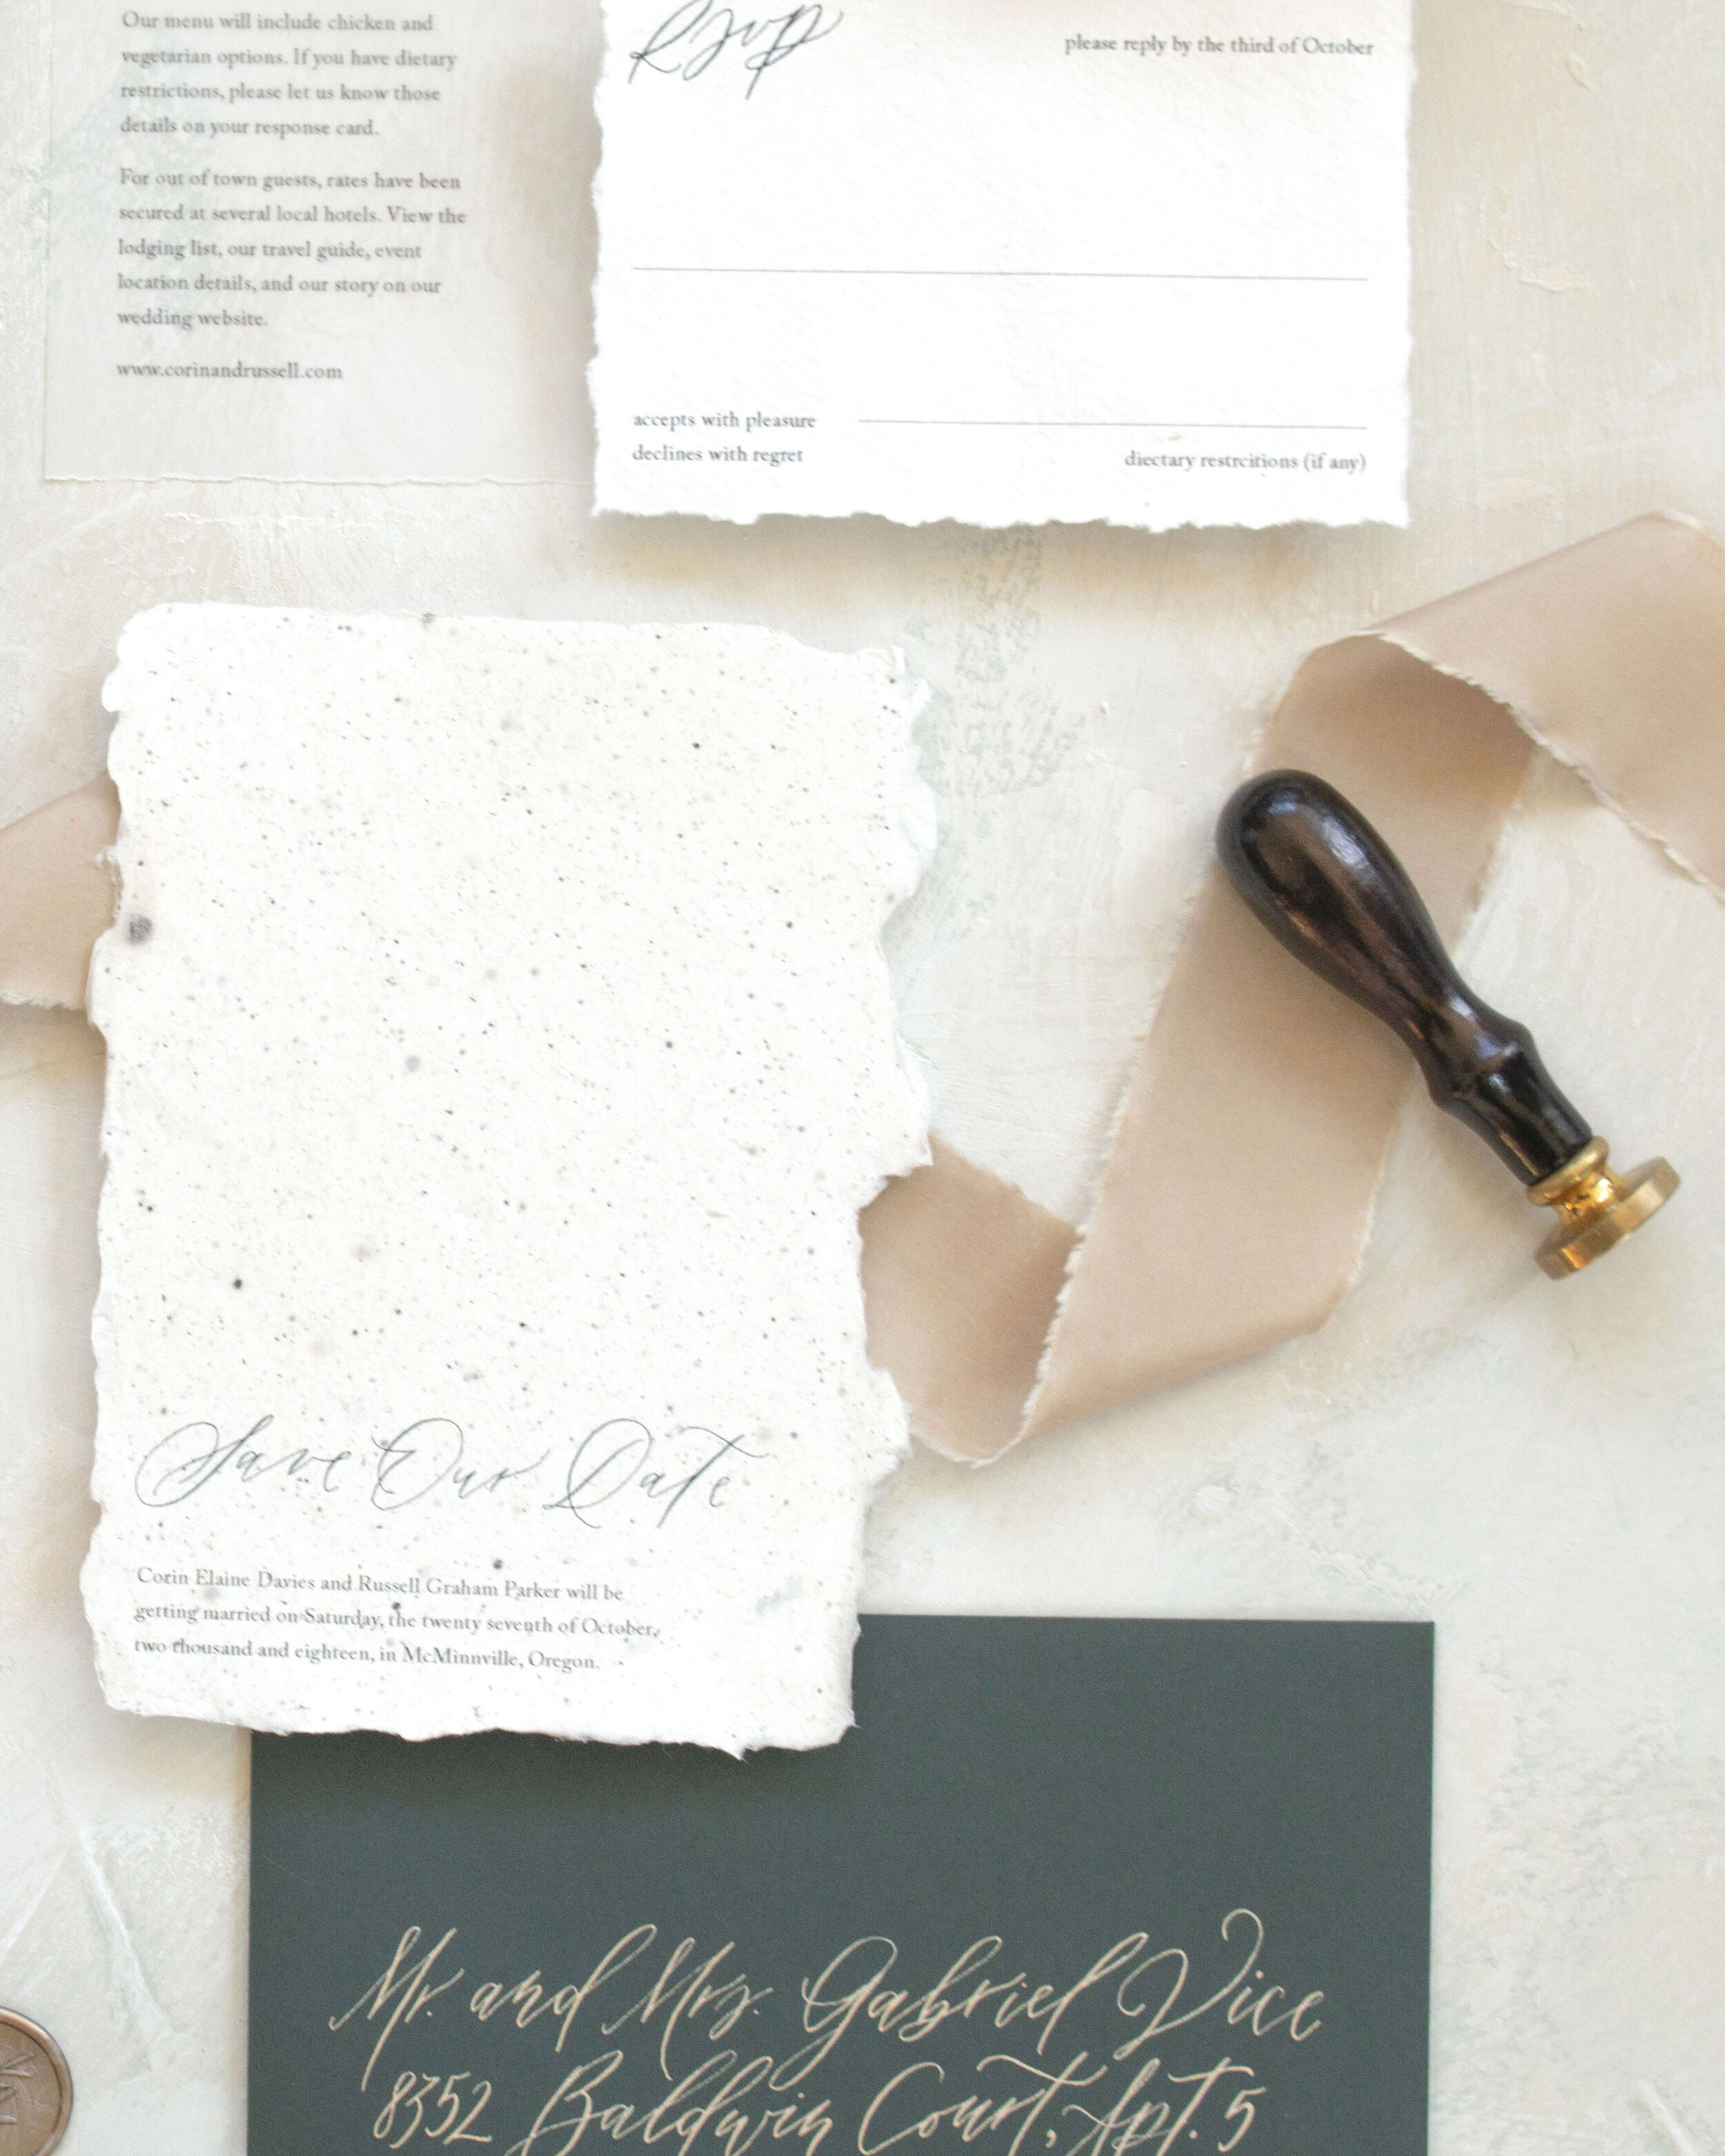 Elegant wedding invitations winter on handmade paper. Calligraphy minimalist wedding invitations. Calligraphy addressing wedding. Handmade paper wax seals vintage postage wedding invitations.